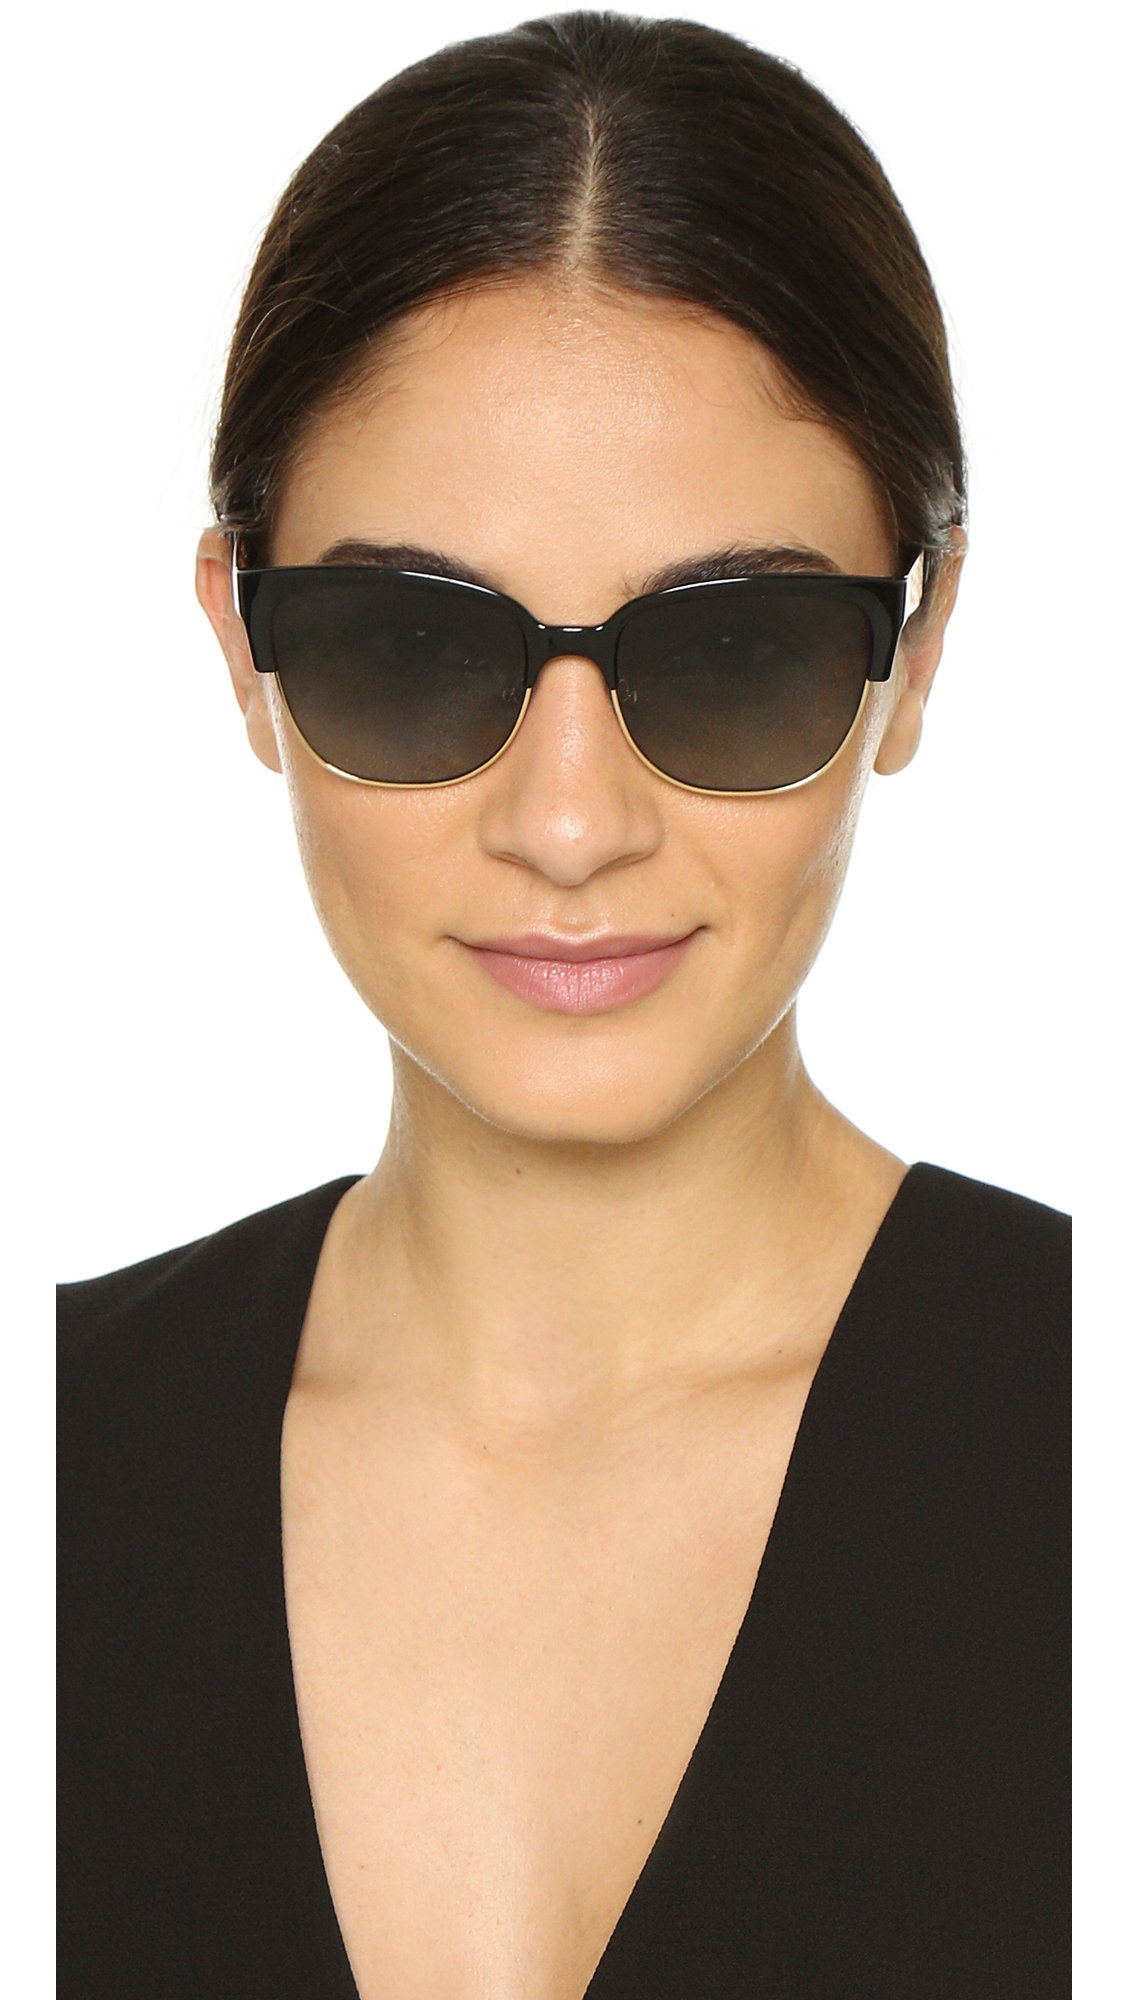 0dbc8d1ce883 Lyst - Tory Burch Rimless Bottom Polarized Sunglasses - Black Gold ...